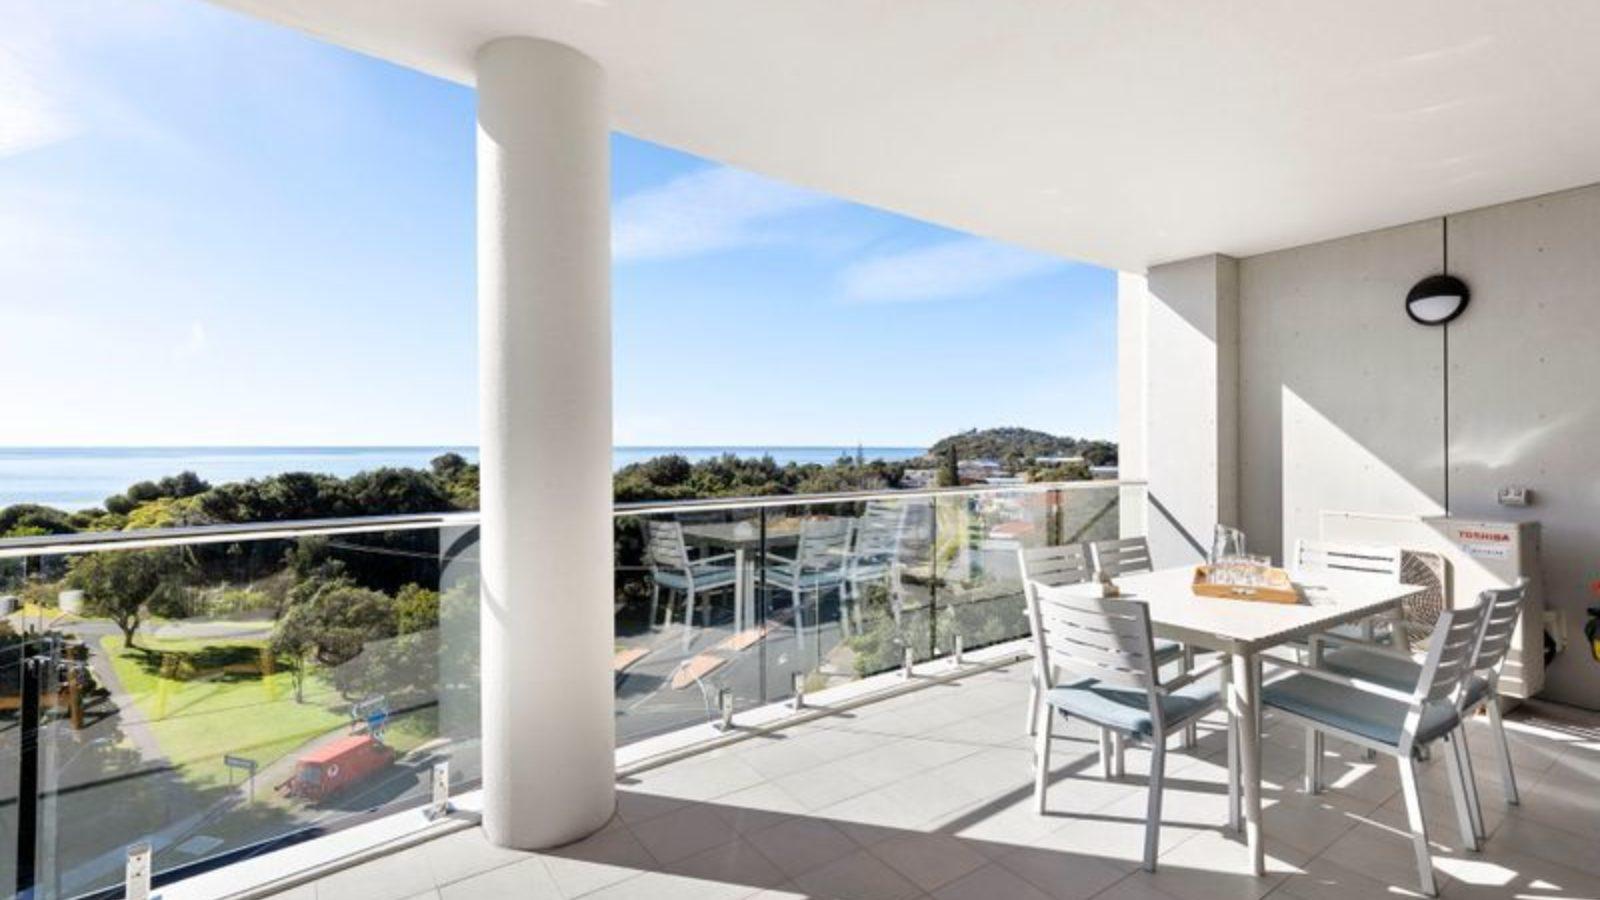 The Cove 603 balcony